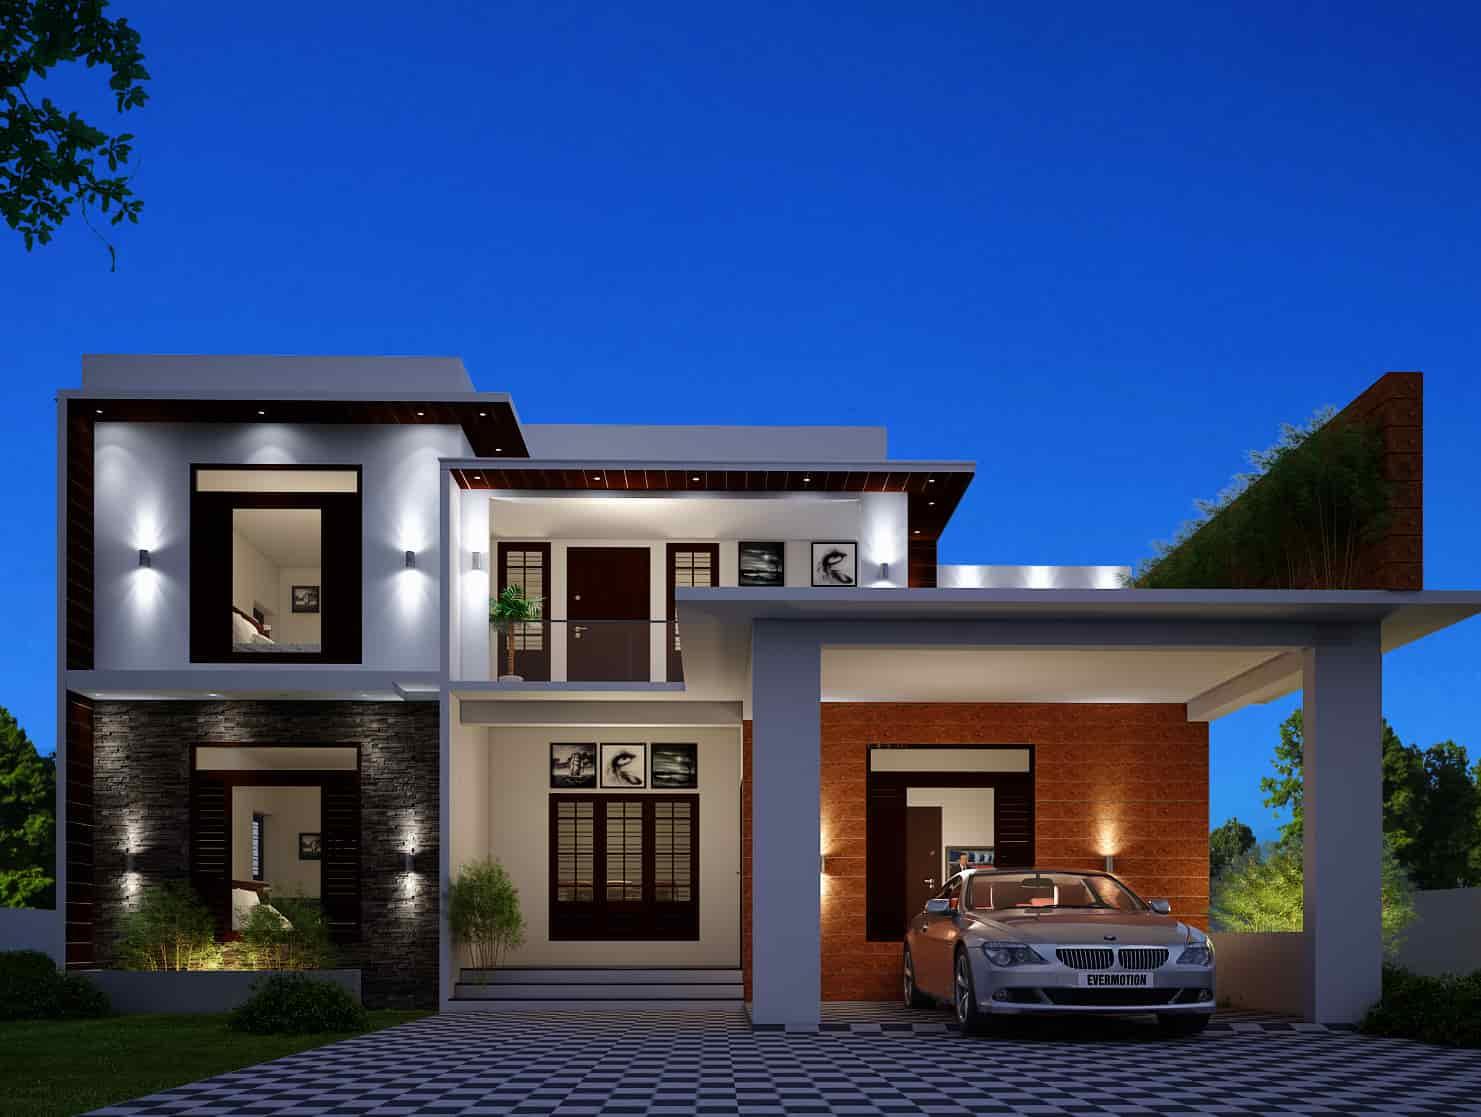 Royal Construction Reviews, Attingal, Thiruvananthapuram - 3 Ratings